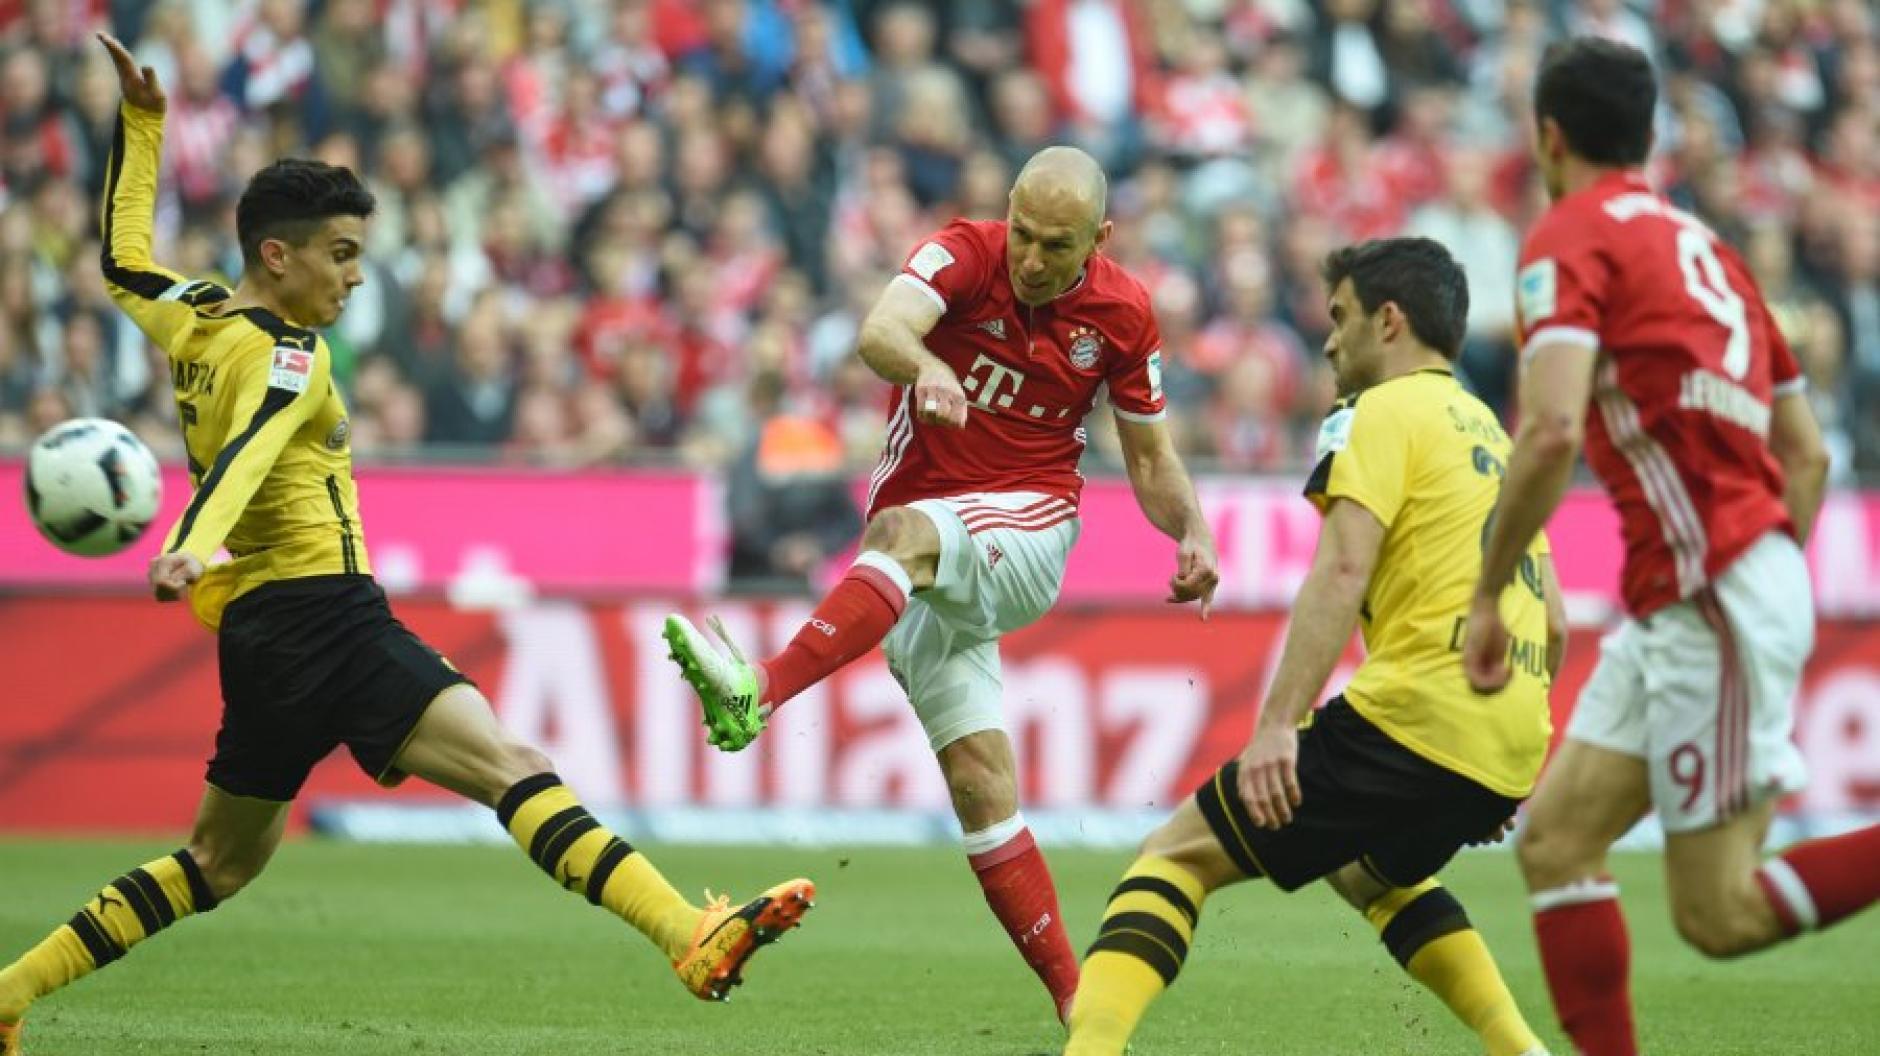 übertragung Dfb Pokal Halbfinale